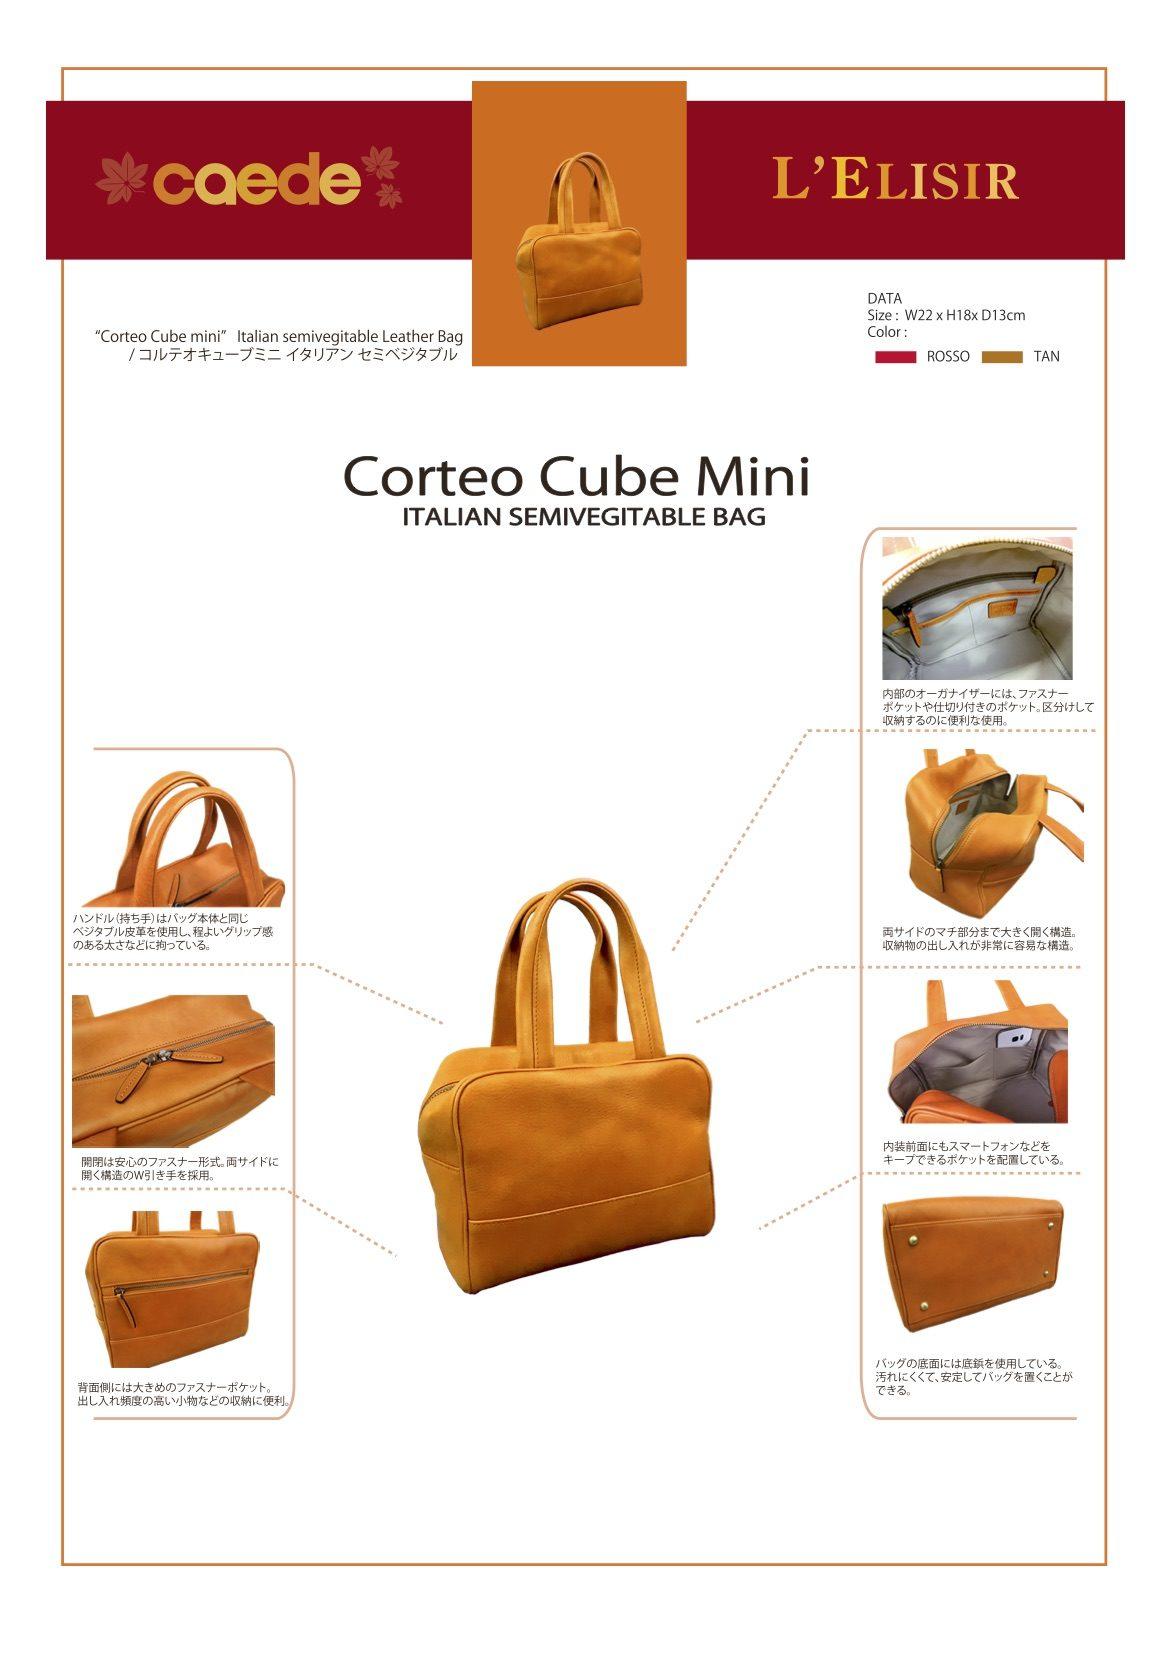 59852 cube mini 機能説明